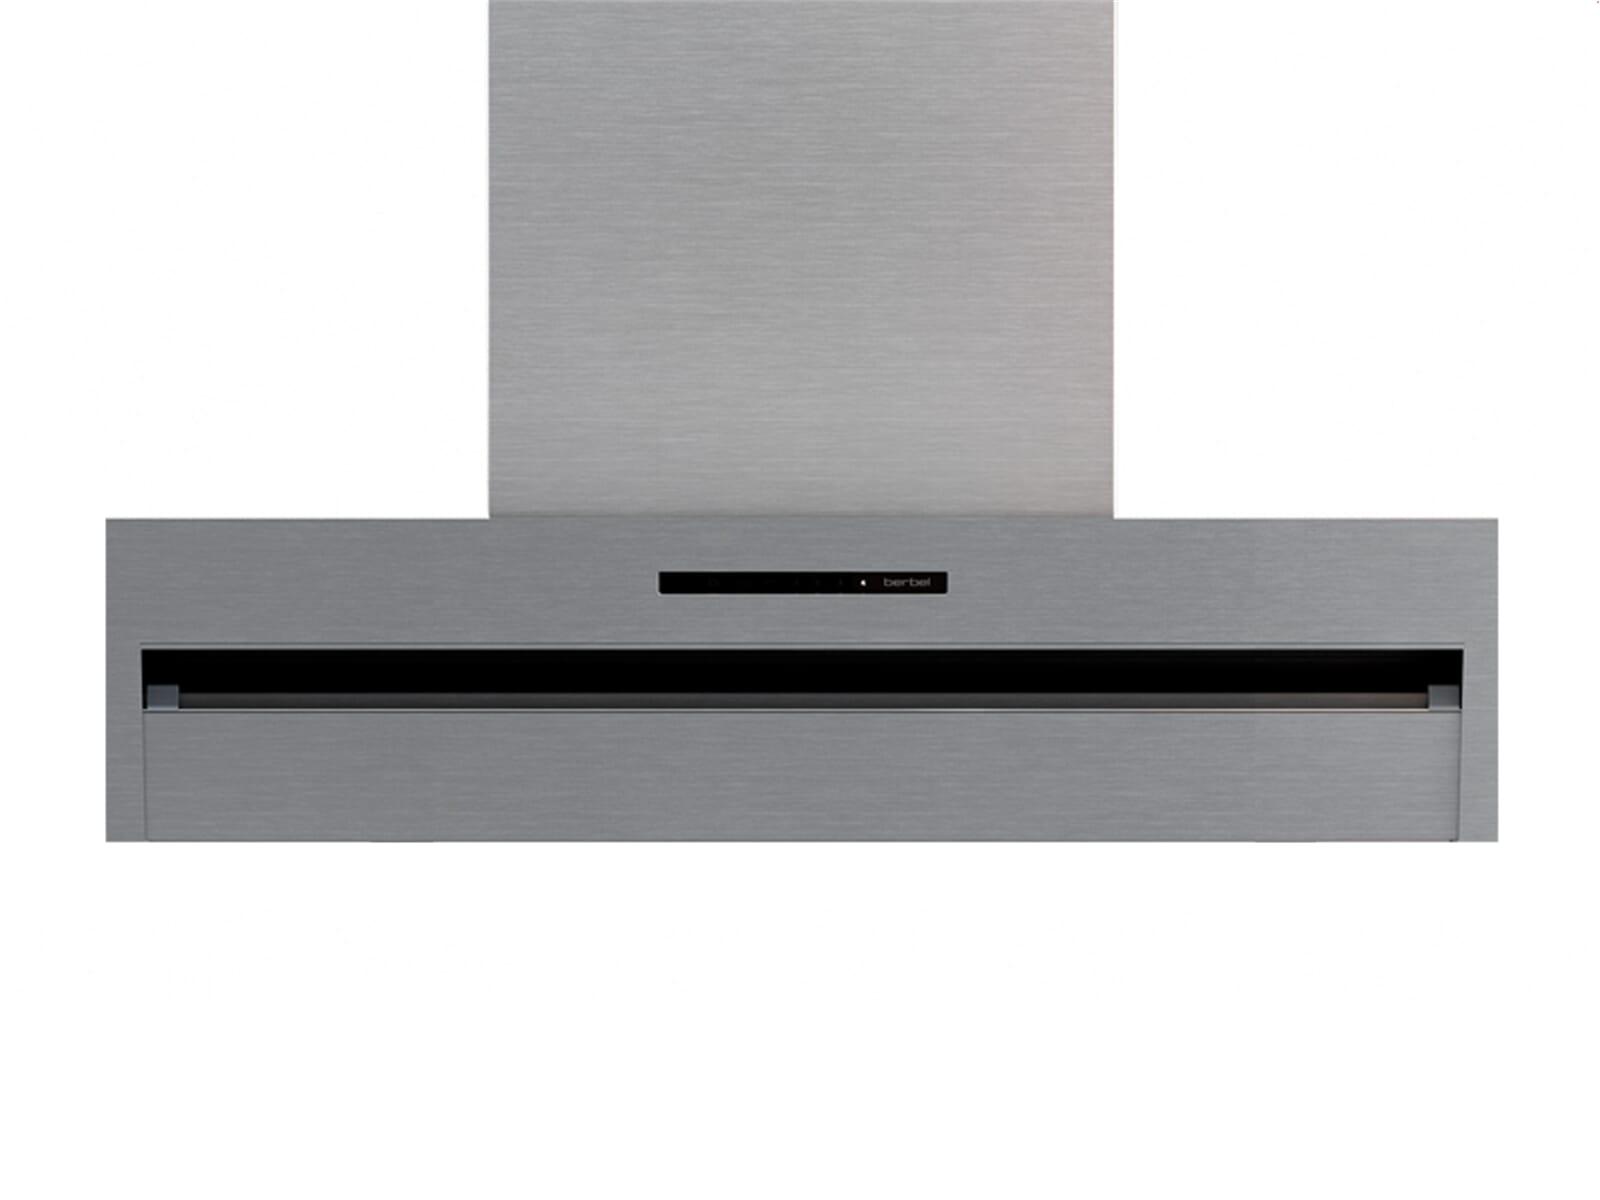 berbel formline bkh 90 fo kopffreihaube edelstahl. Black Bedroom Furniture Sets. Home Design Ideas